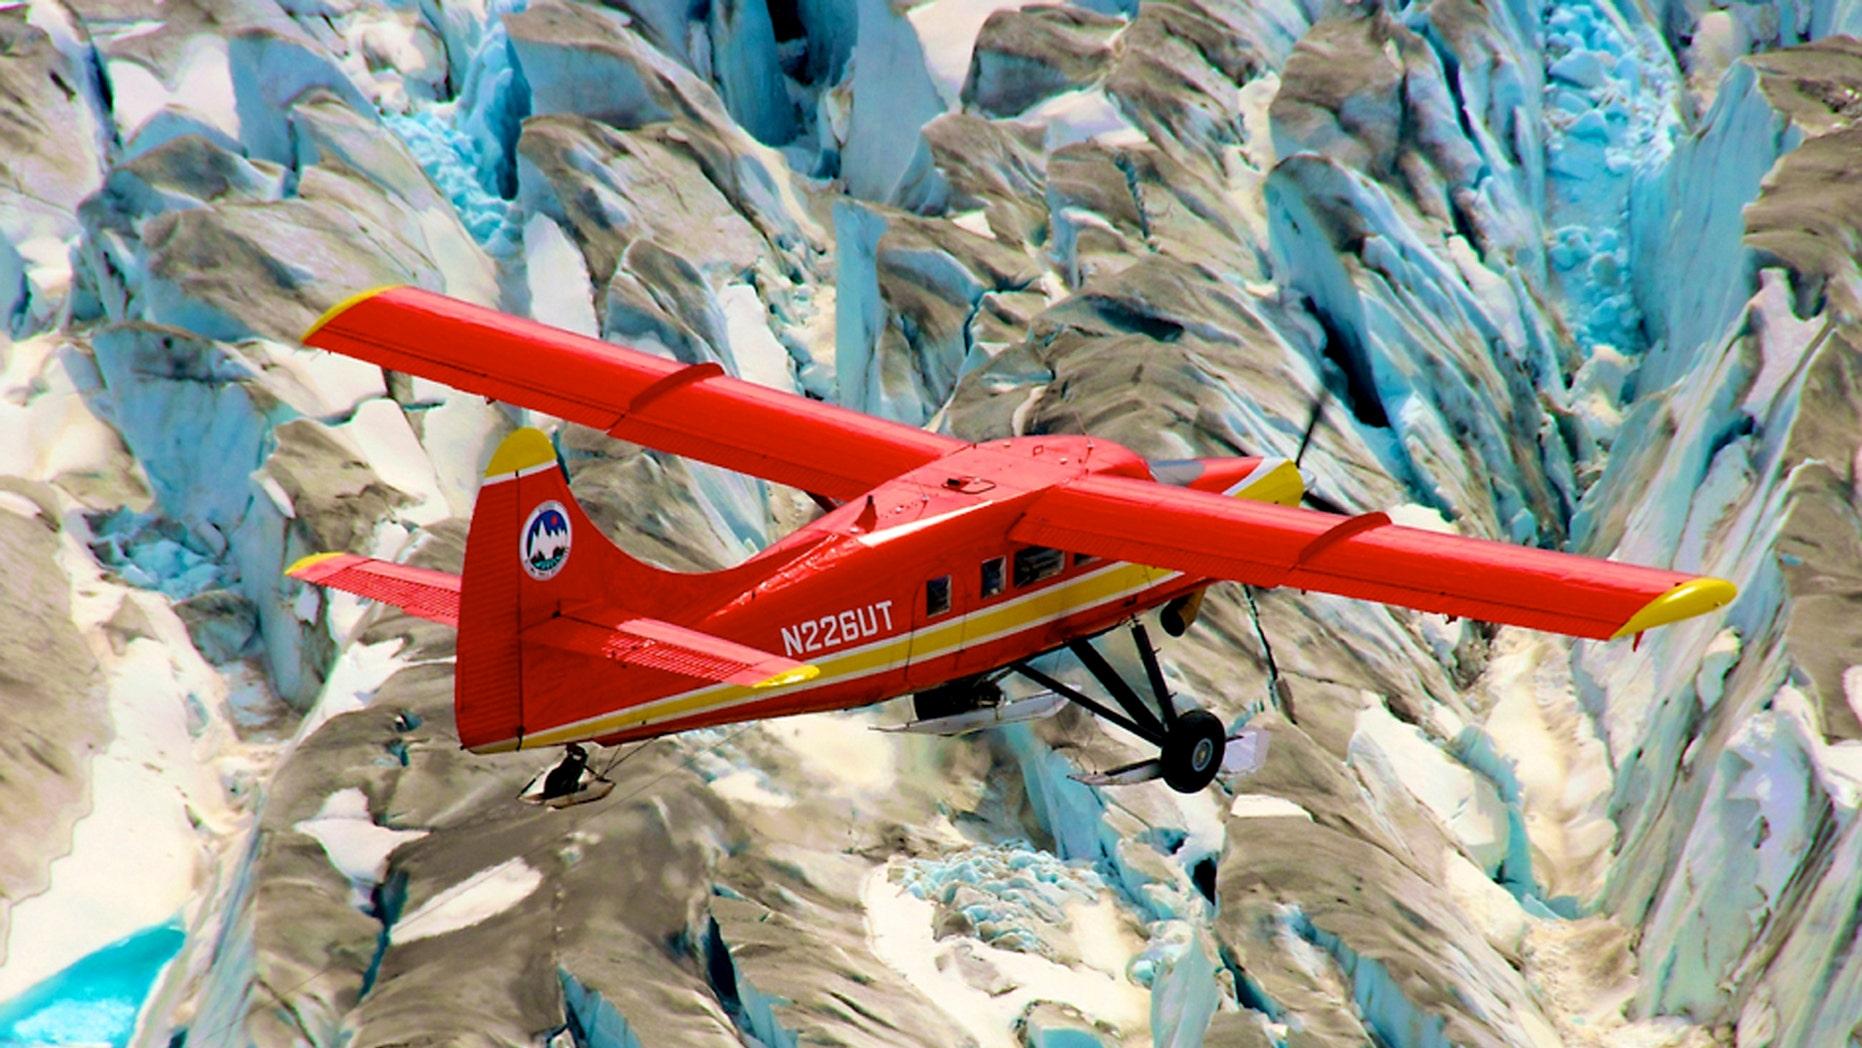 NASA's DHC-3 Otter plane flies in Operation IceBridge-Alaska surveys of mountain glaciers.